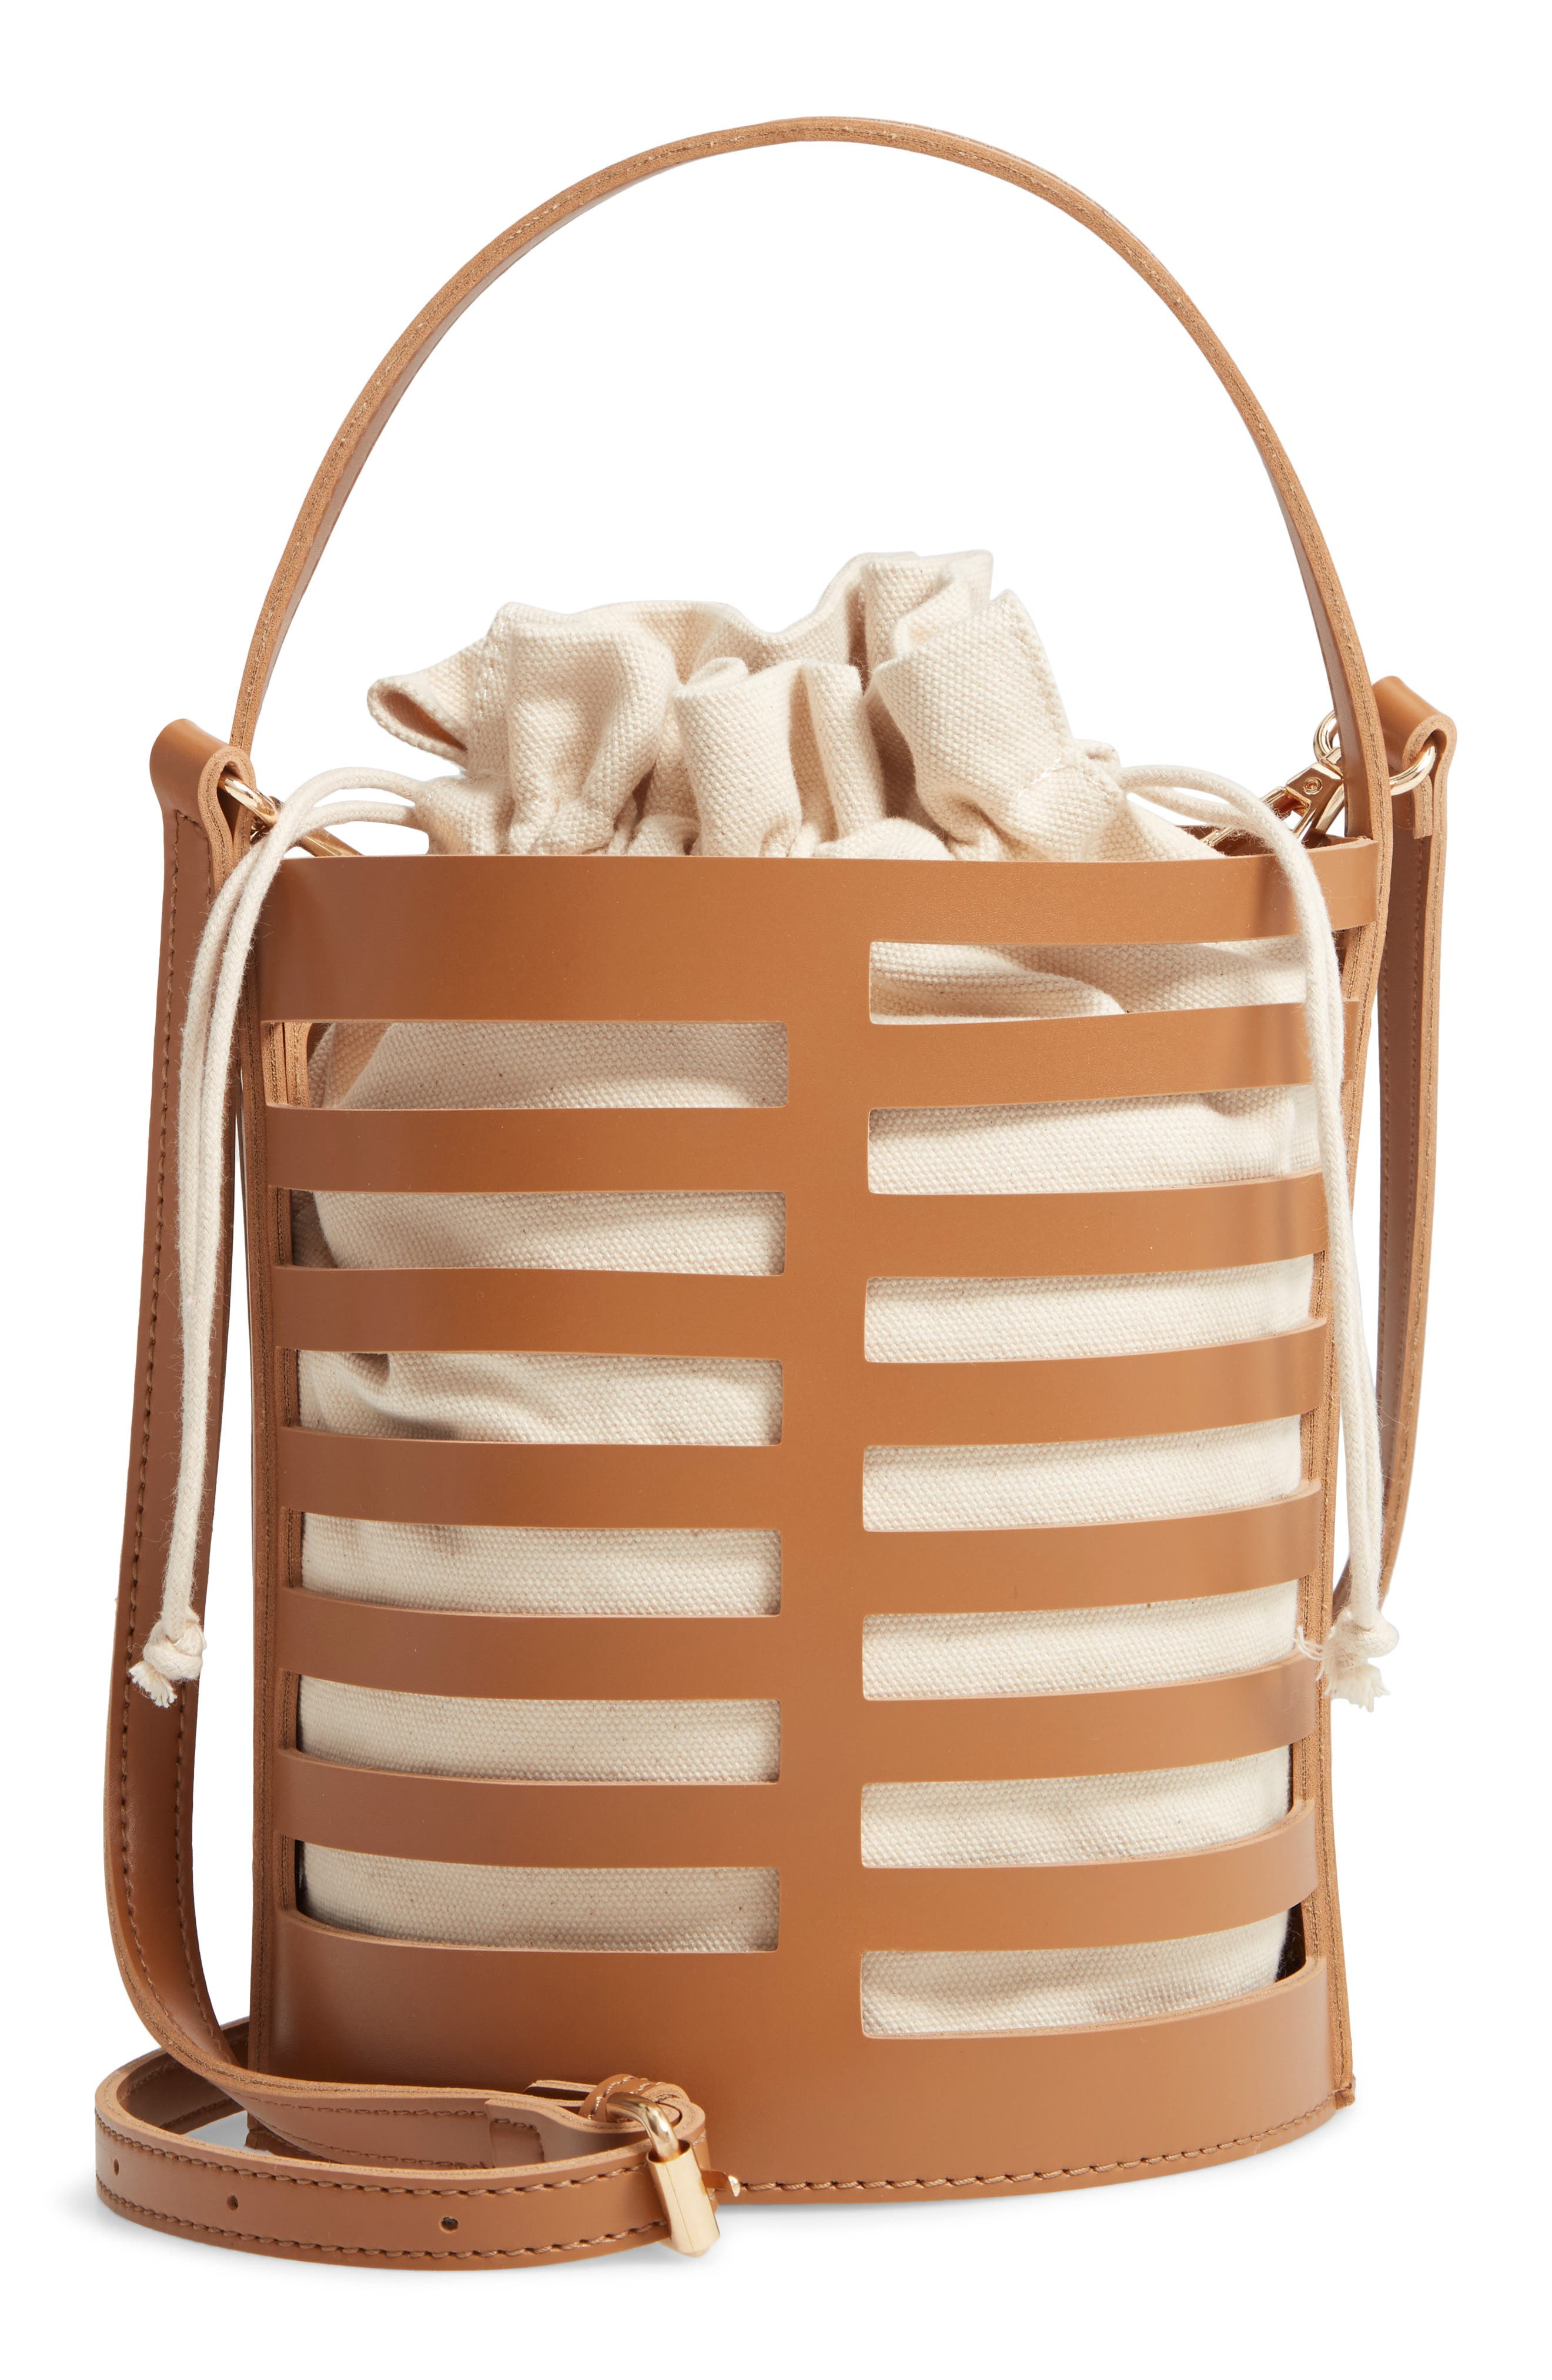 Cutout Round Bucket Crossbody Bag, Main, color, TAN